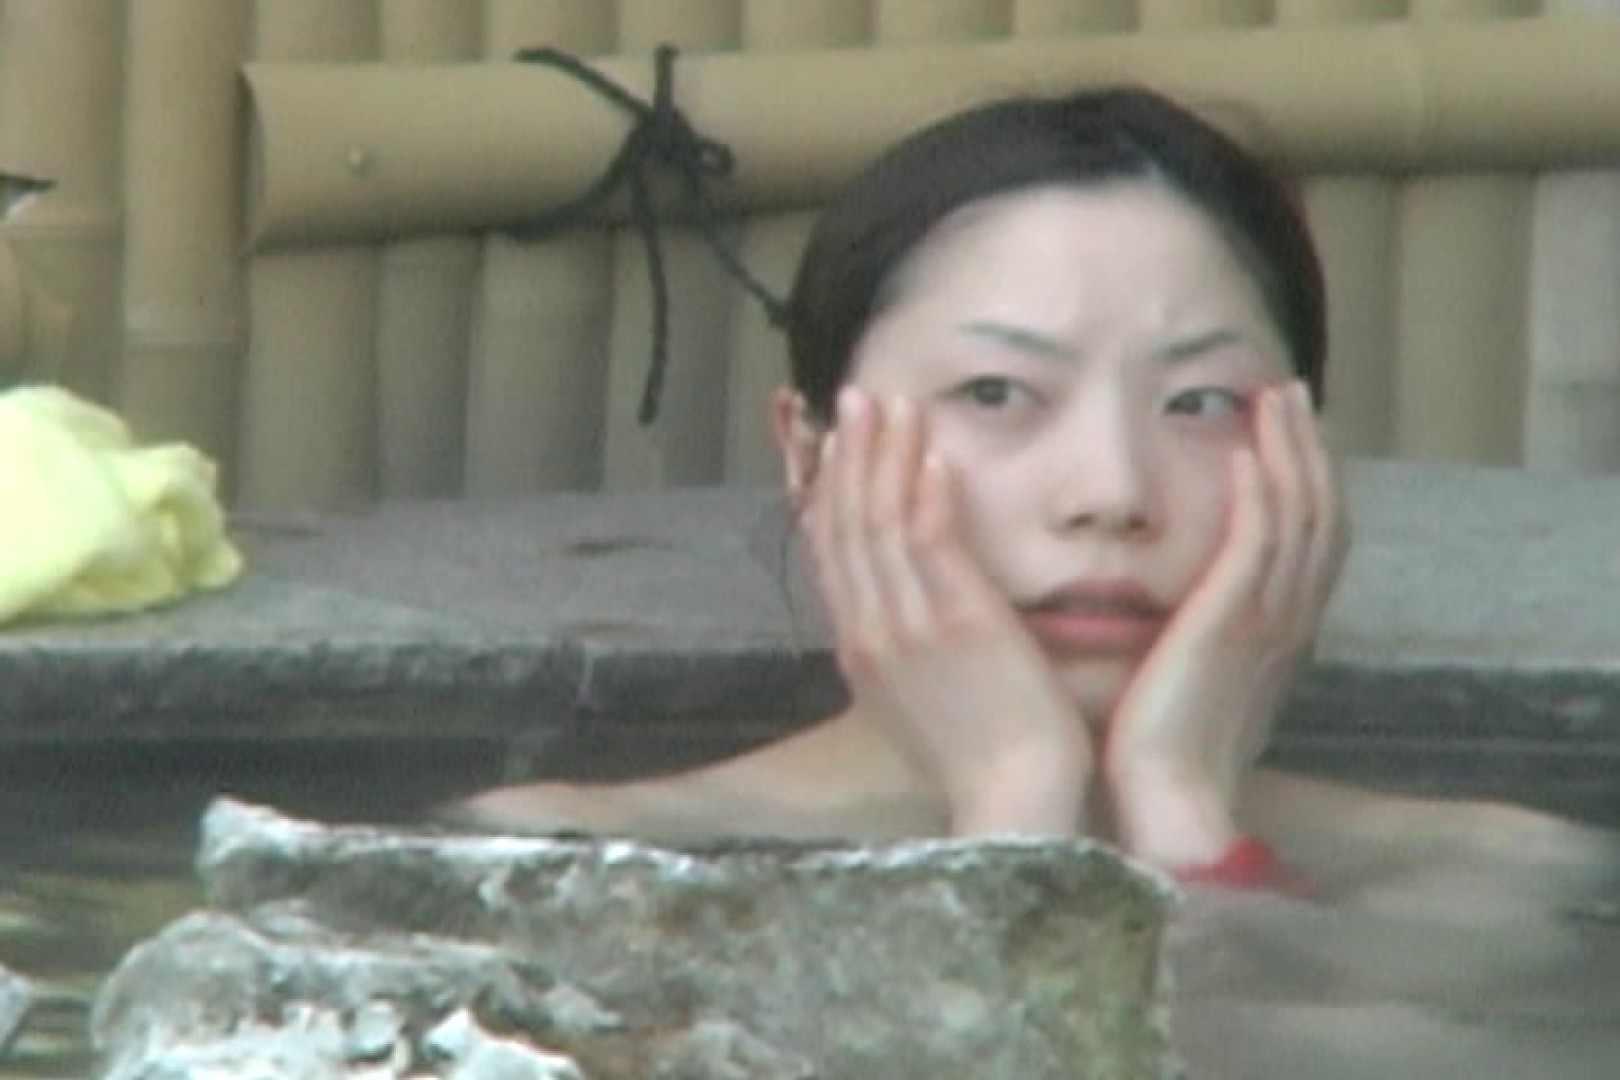 Aquaな露天風呂Vol.596 OLセックス  77画像 3